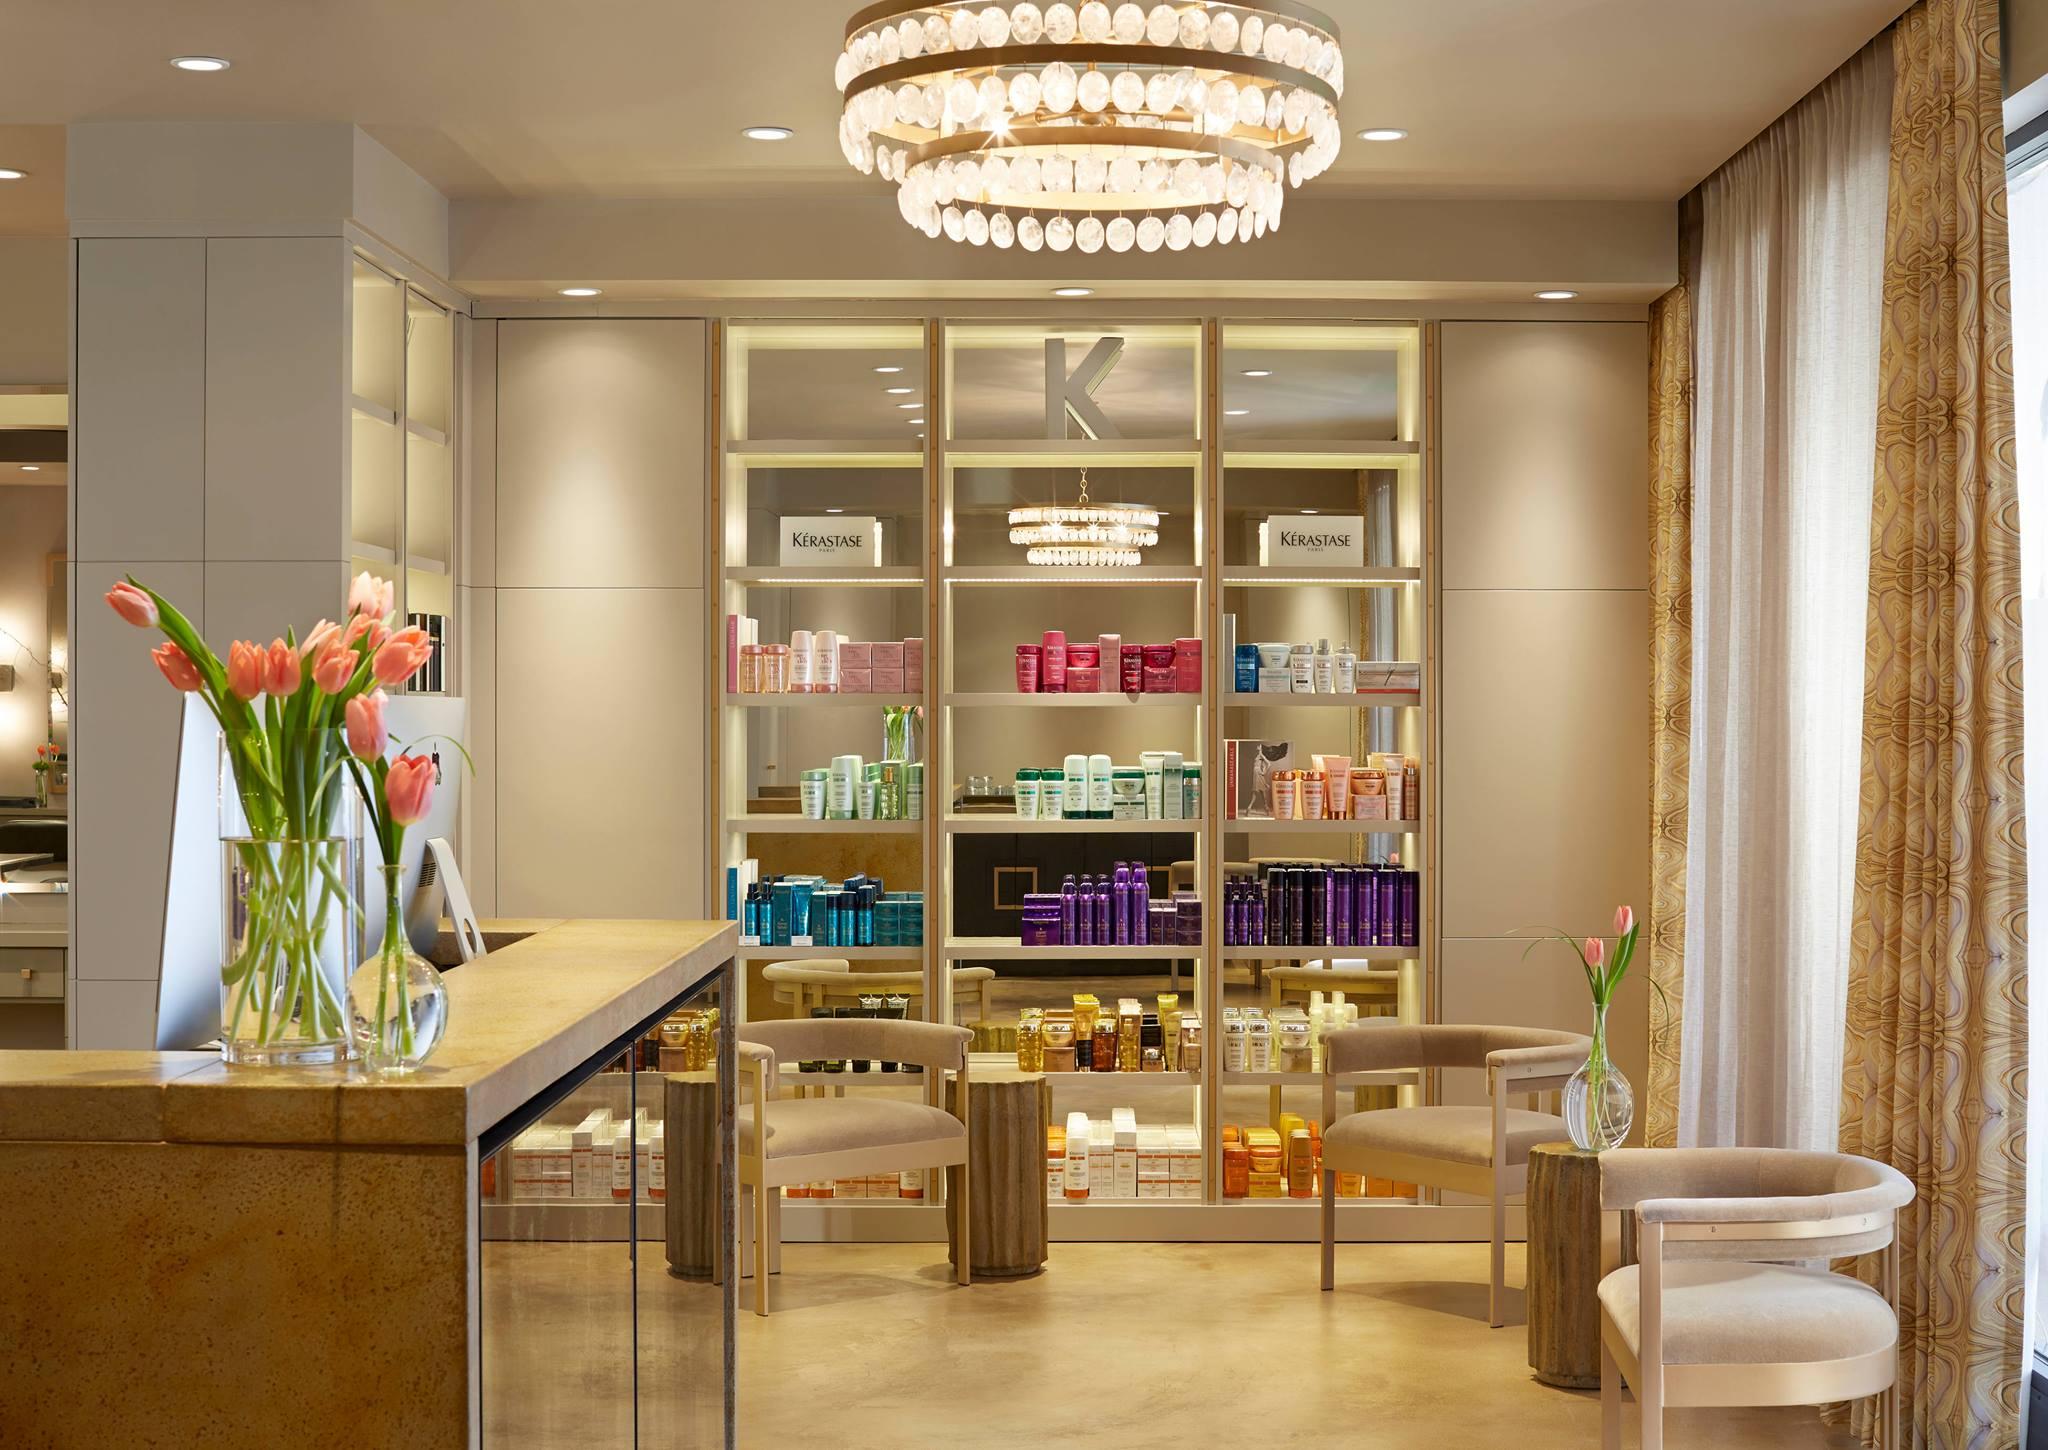 Keri Gold Salon Spring Recharge Renew